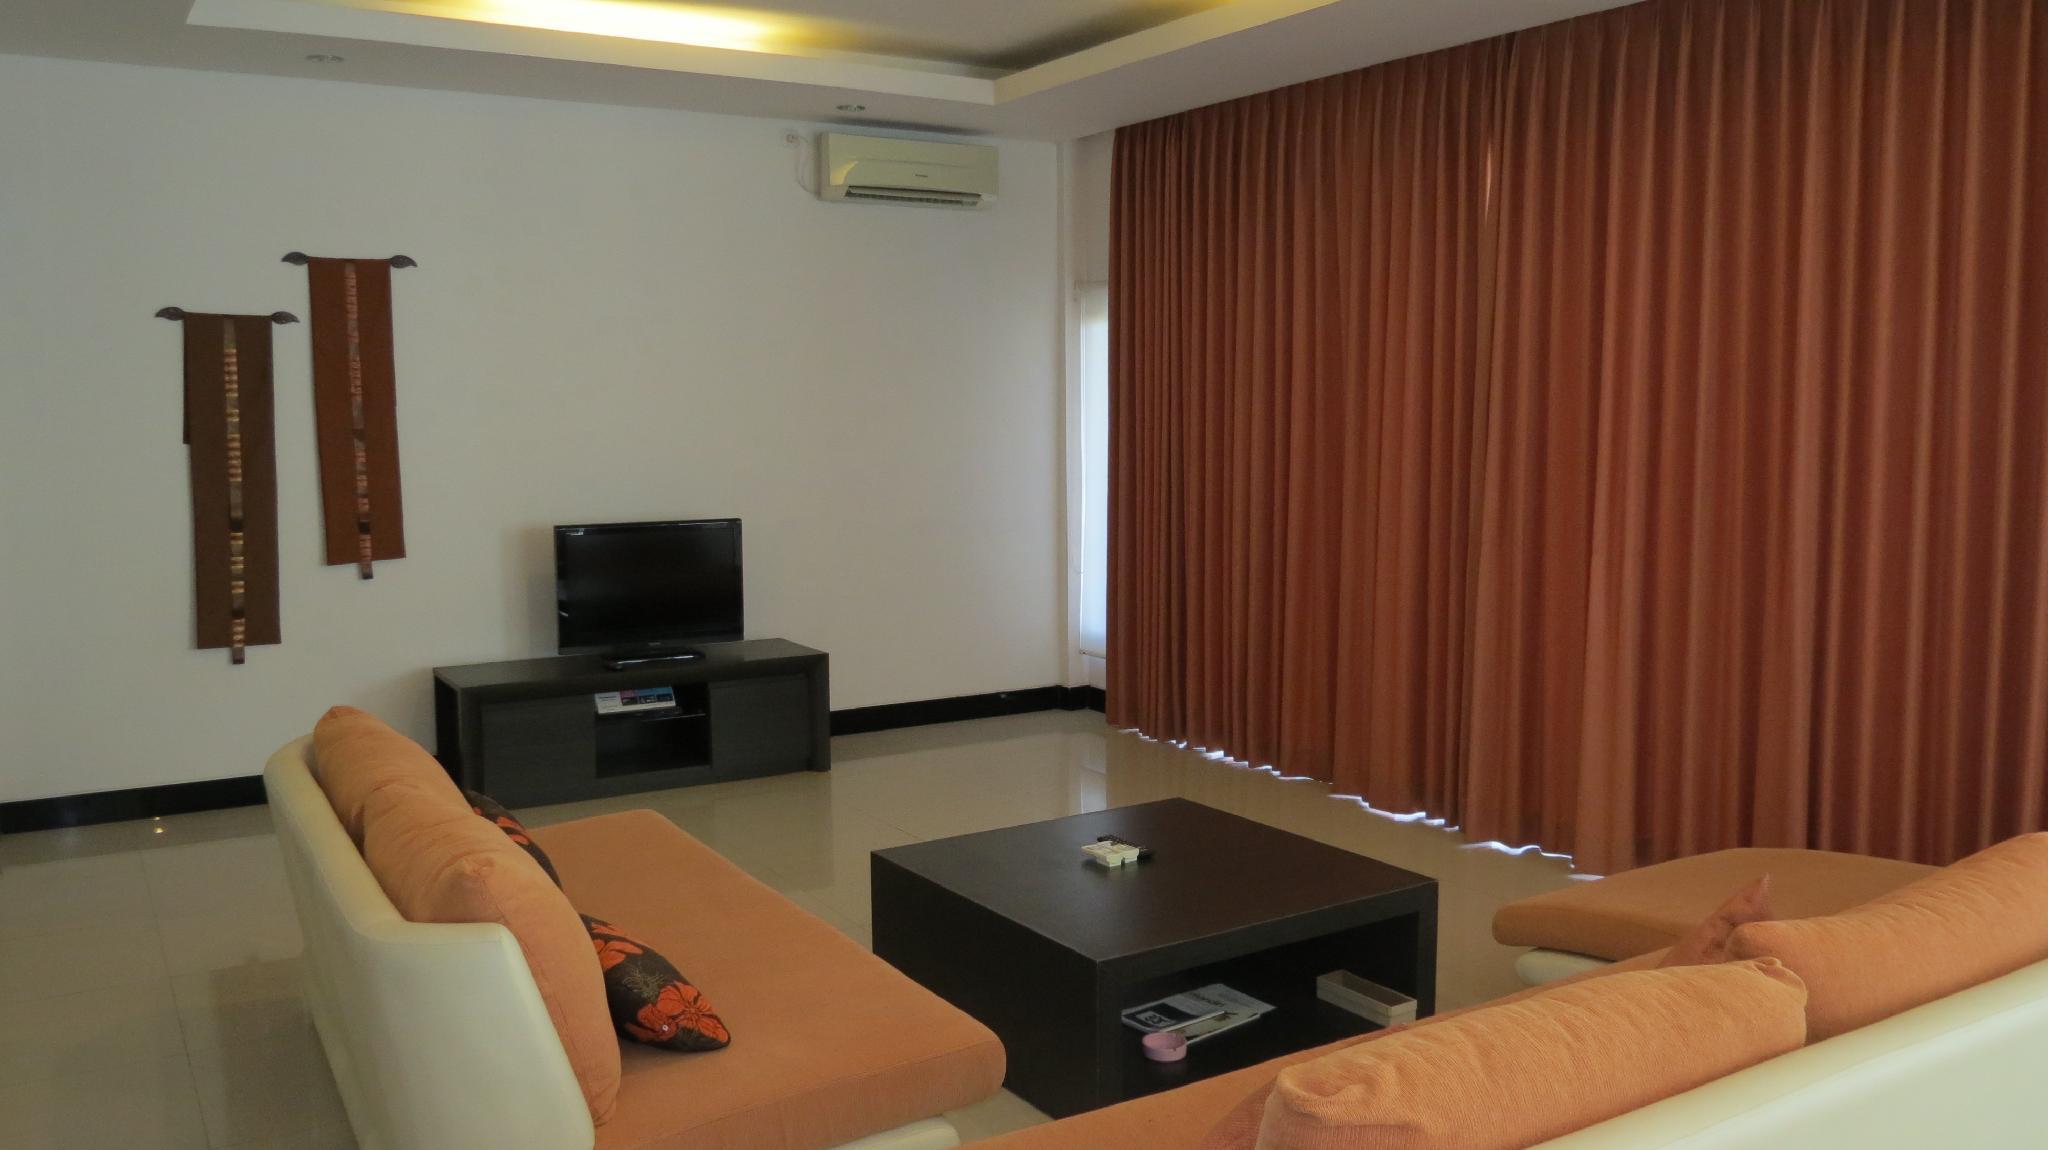 Beachside Suite And Village 3 Bedroom